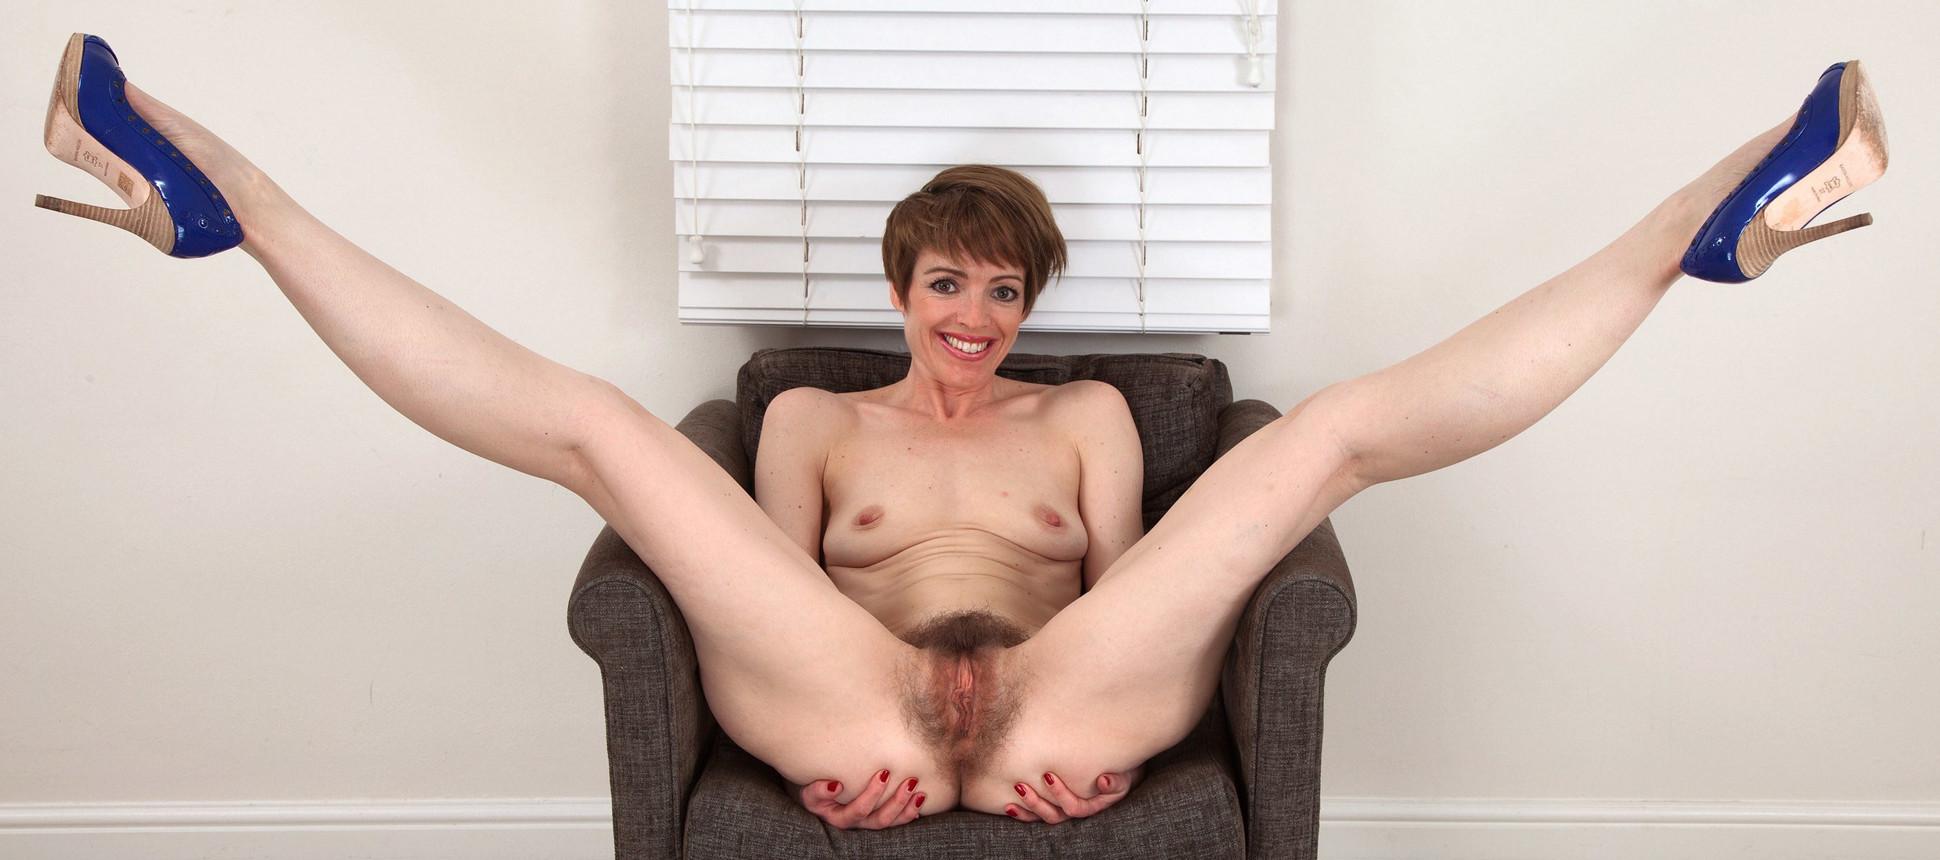 Hot nude women spreading wide gifs — 4